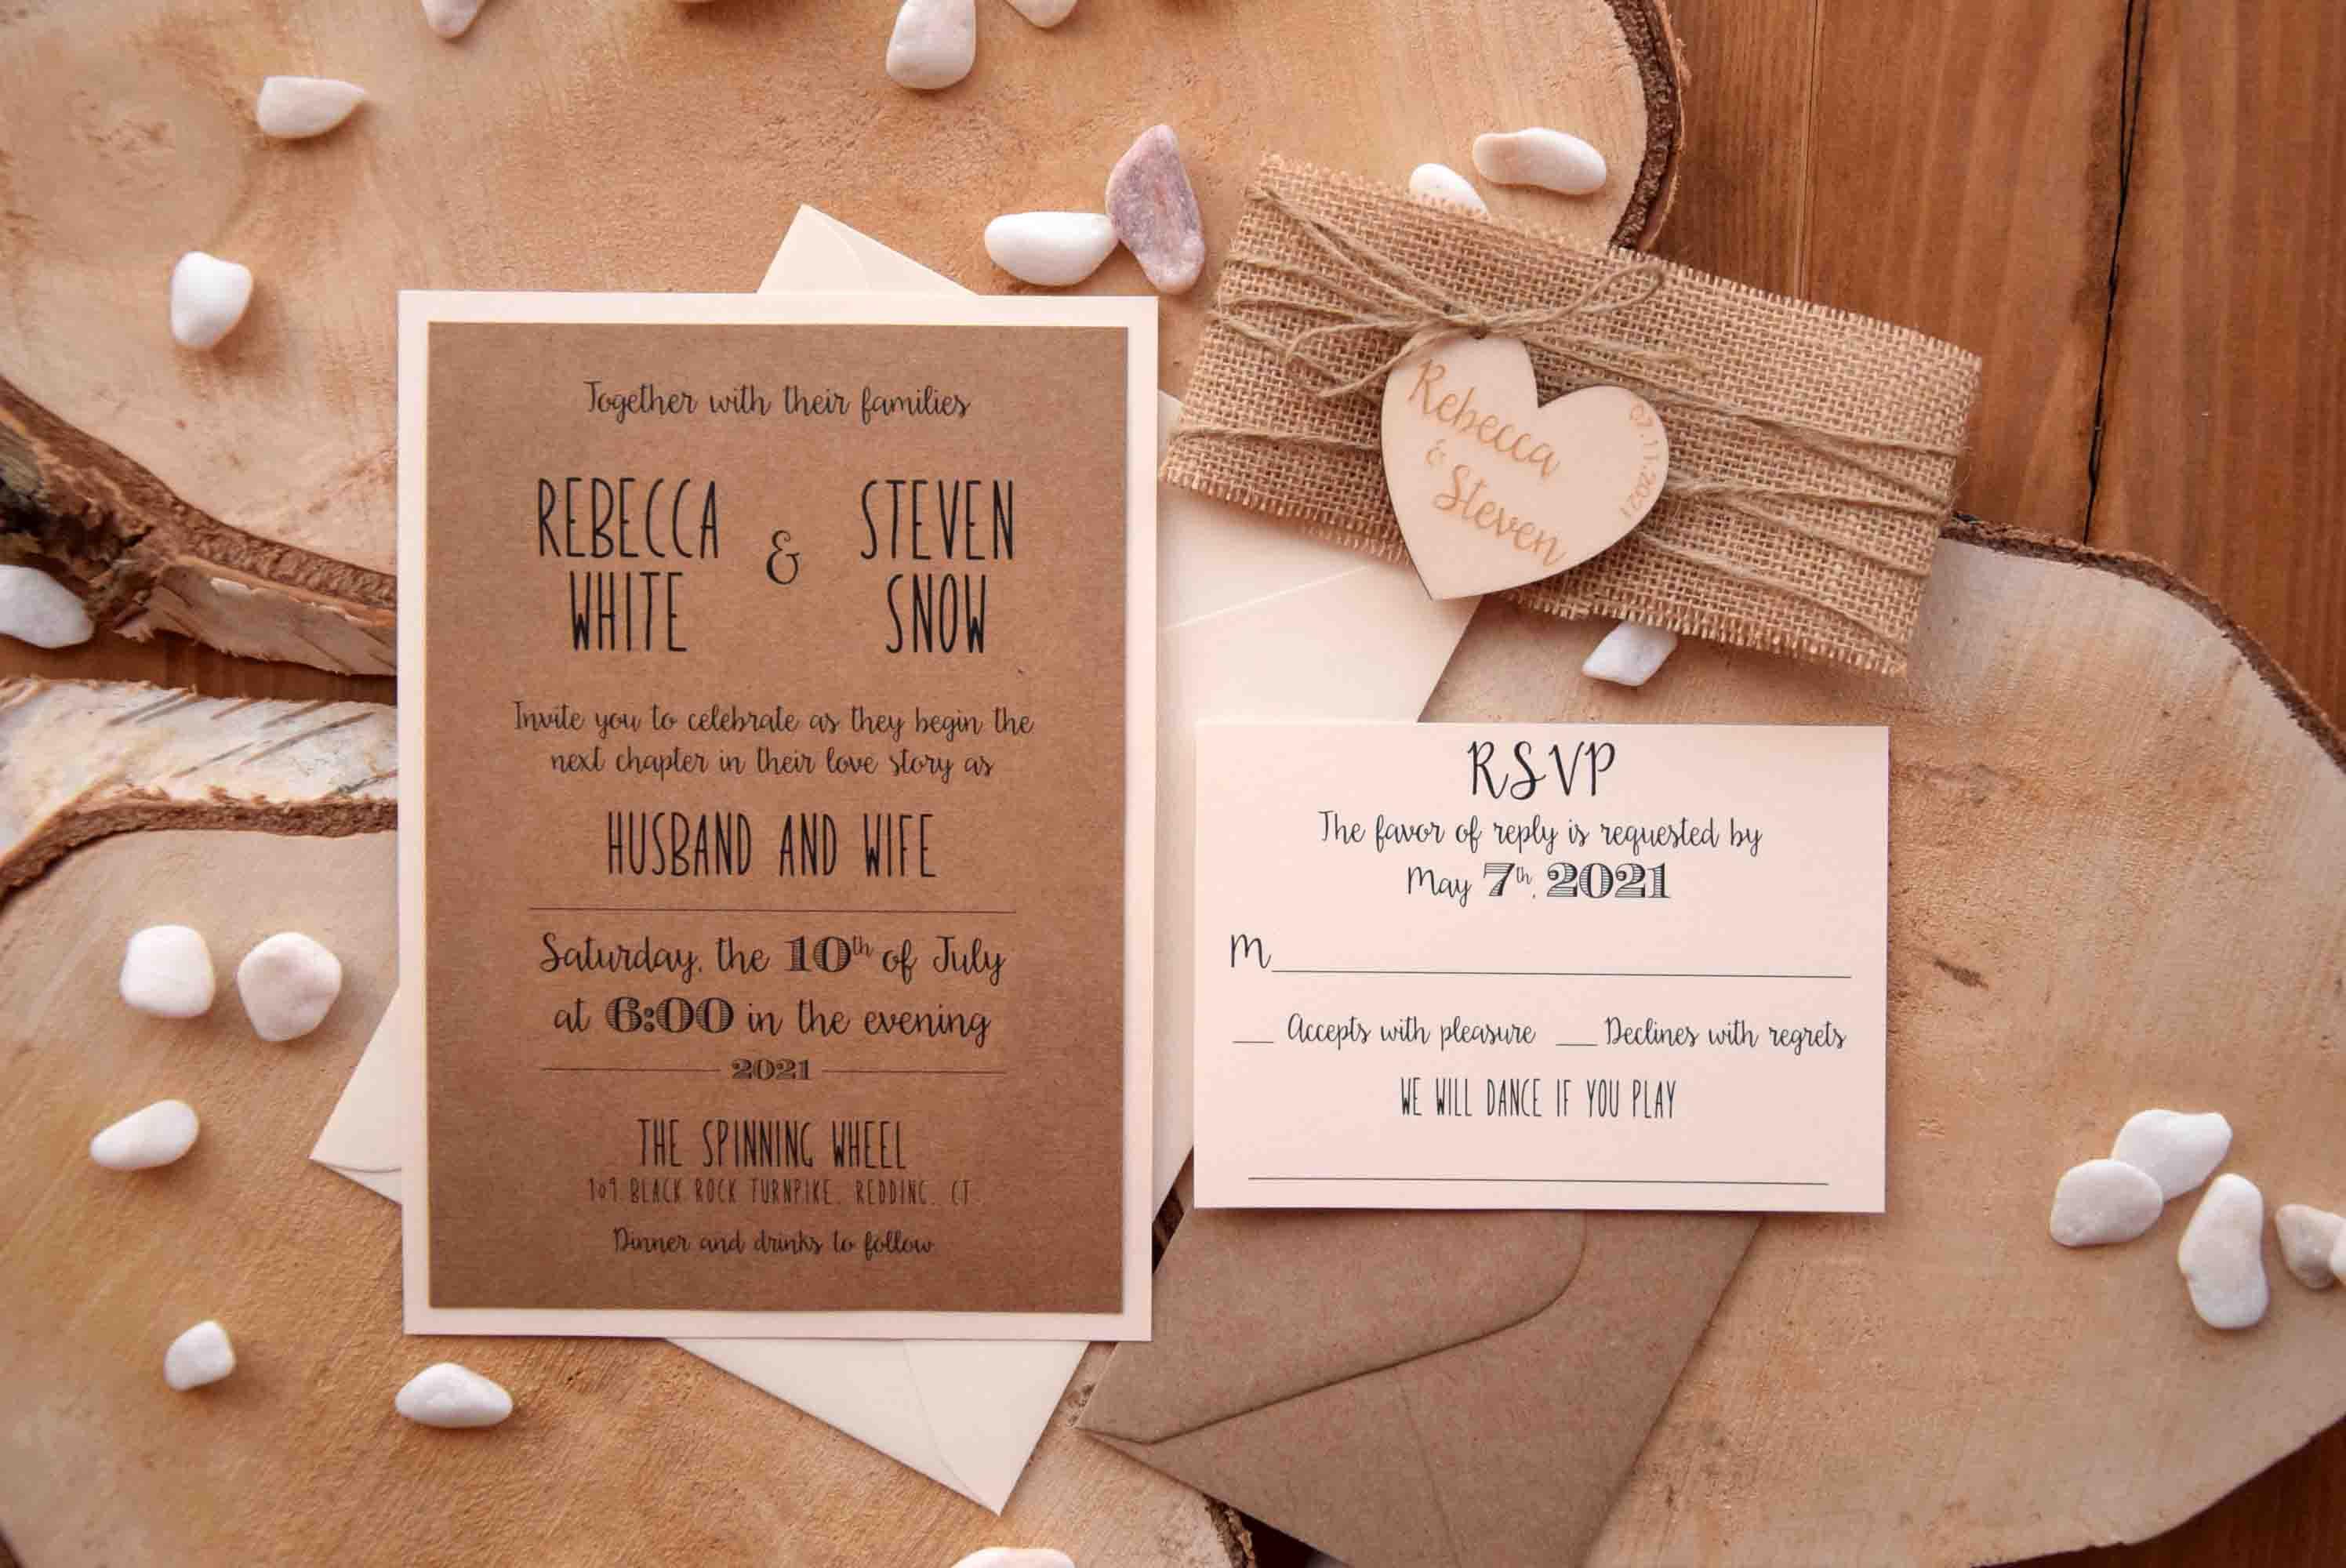 Rustic Wedding Invitation With Wood Heart, Wood Rustic Invites